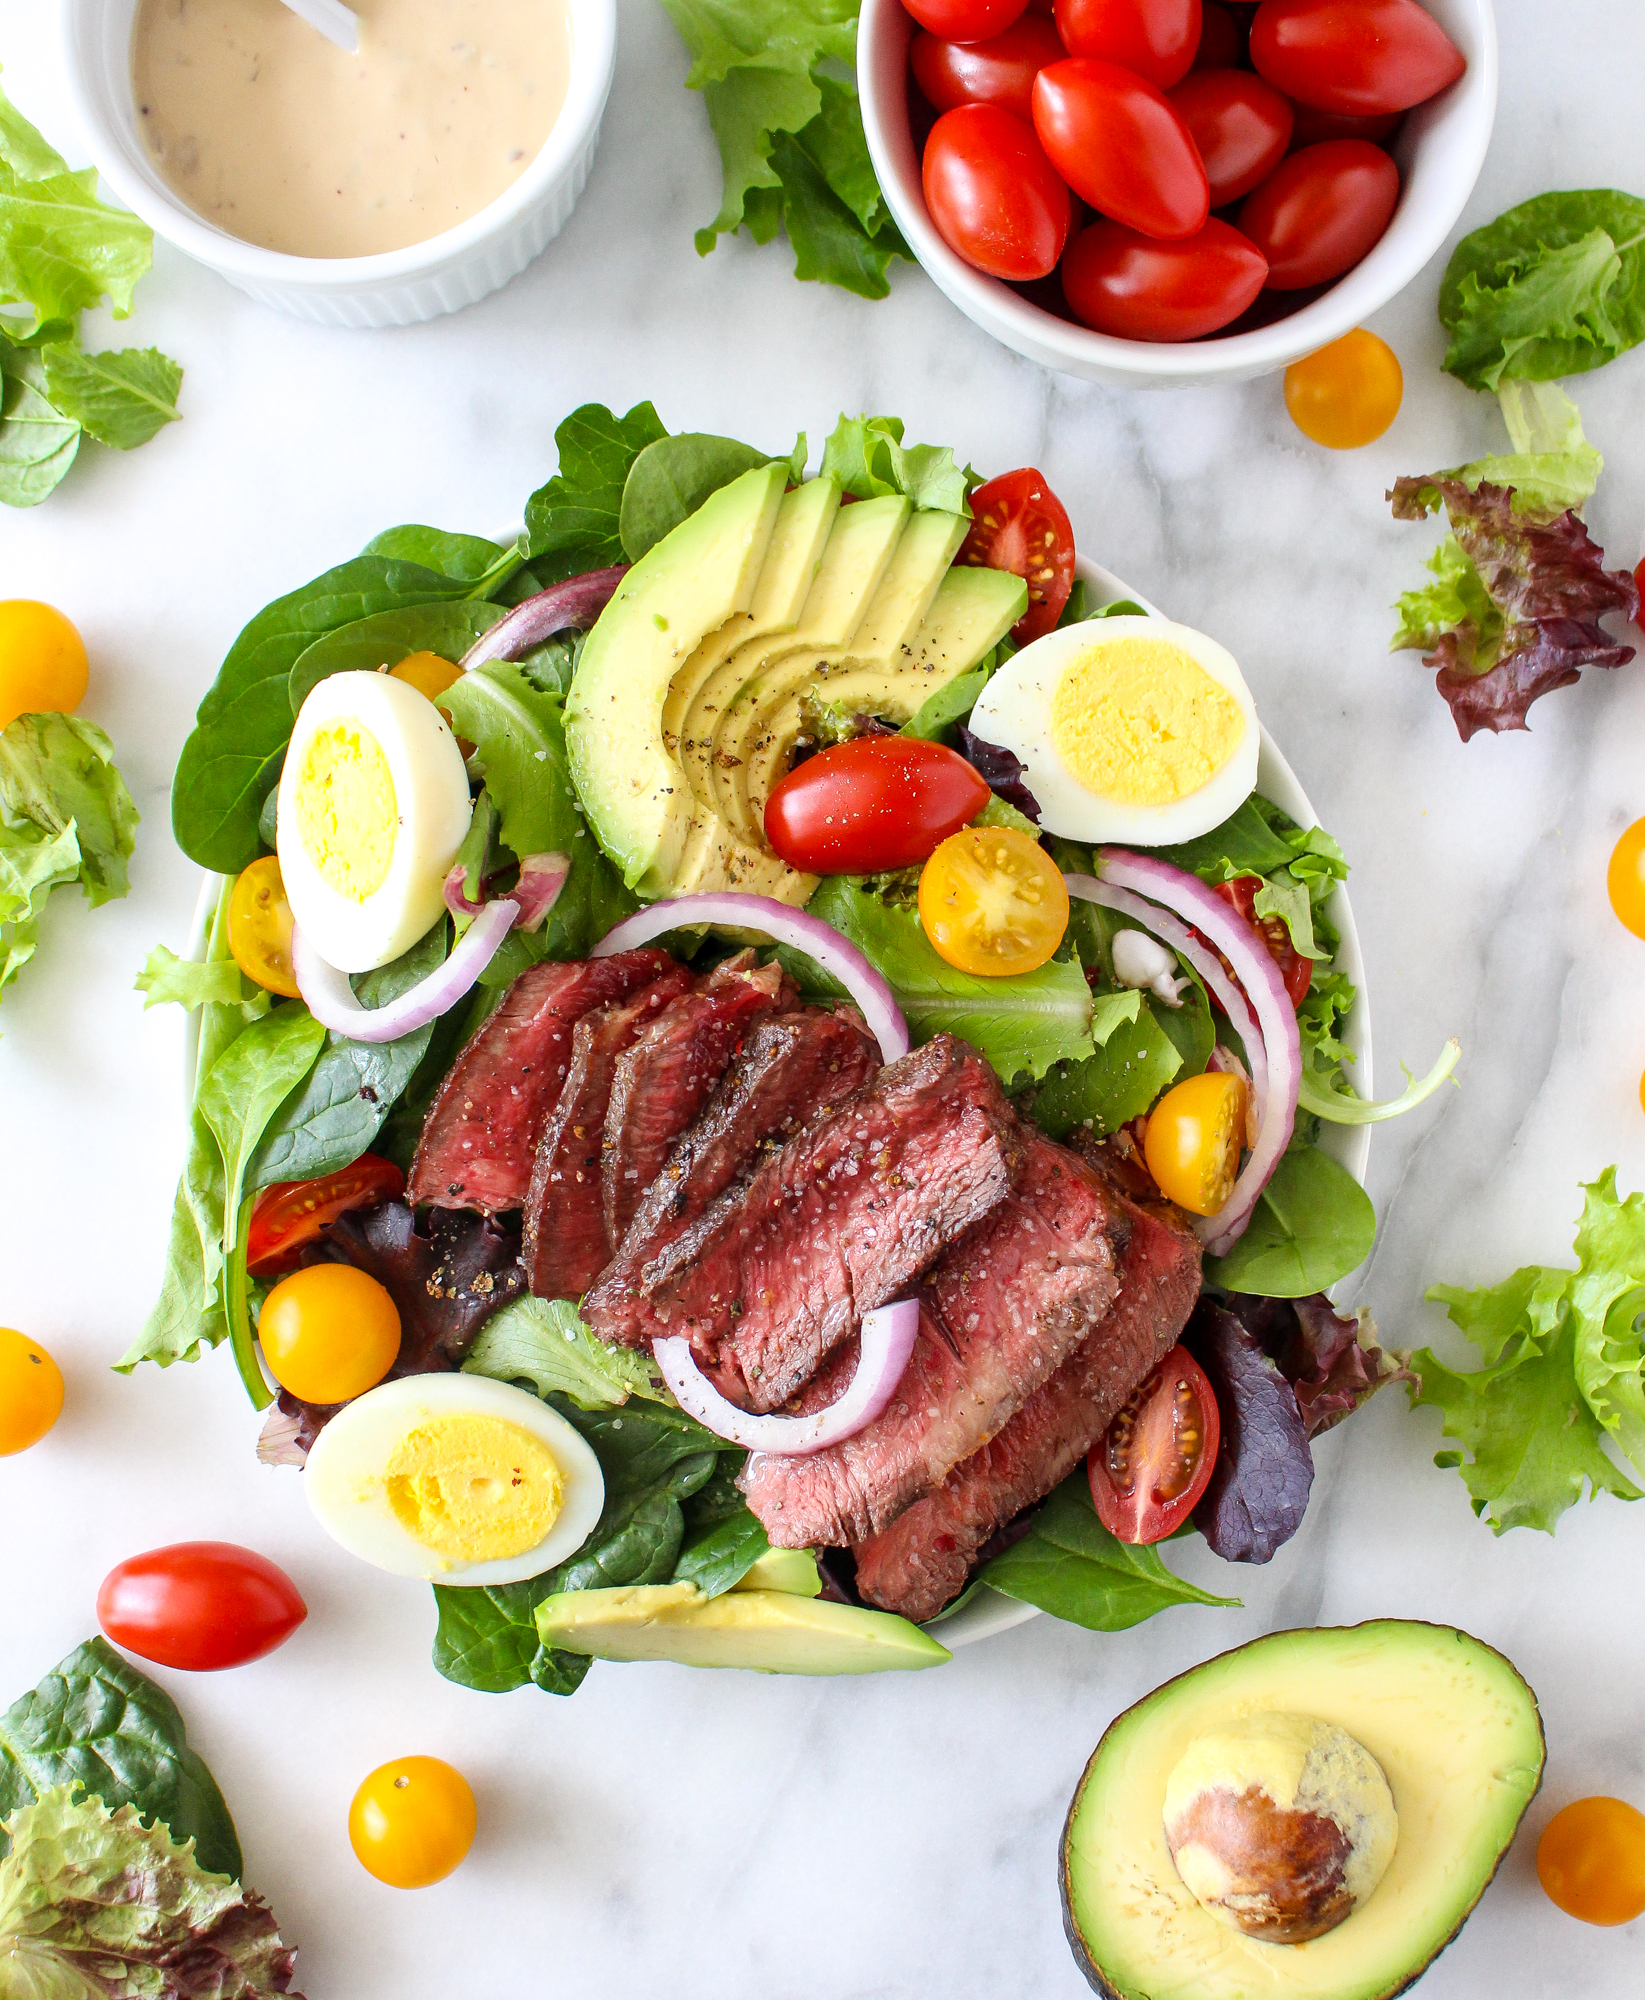 Steak Cobb Salad With Caramelized Onion Yogurt Dressing